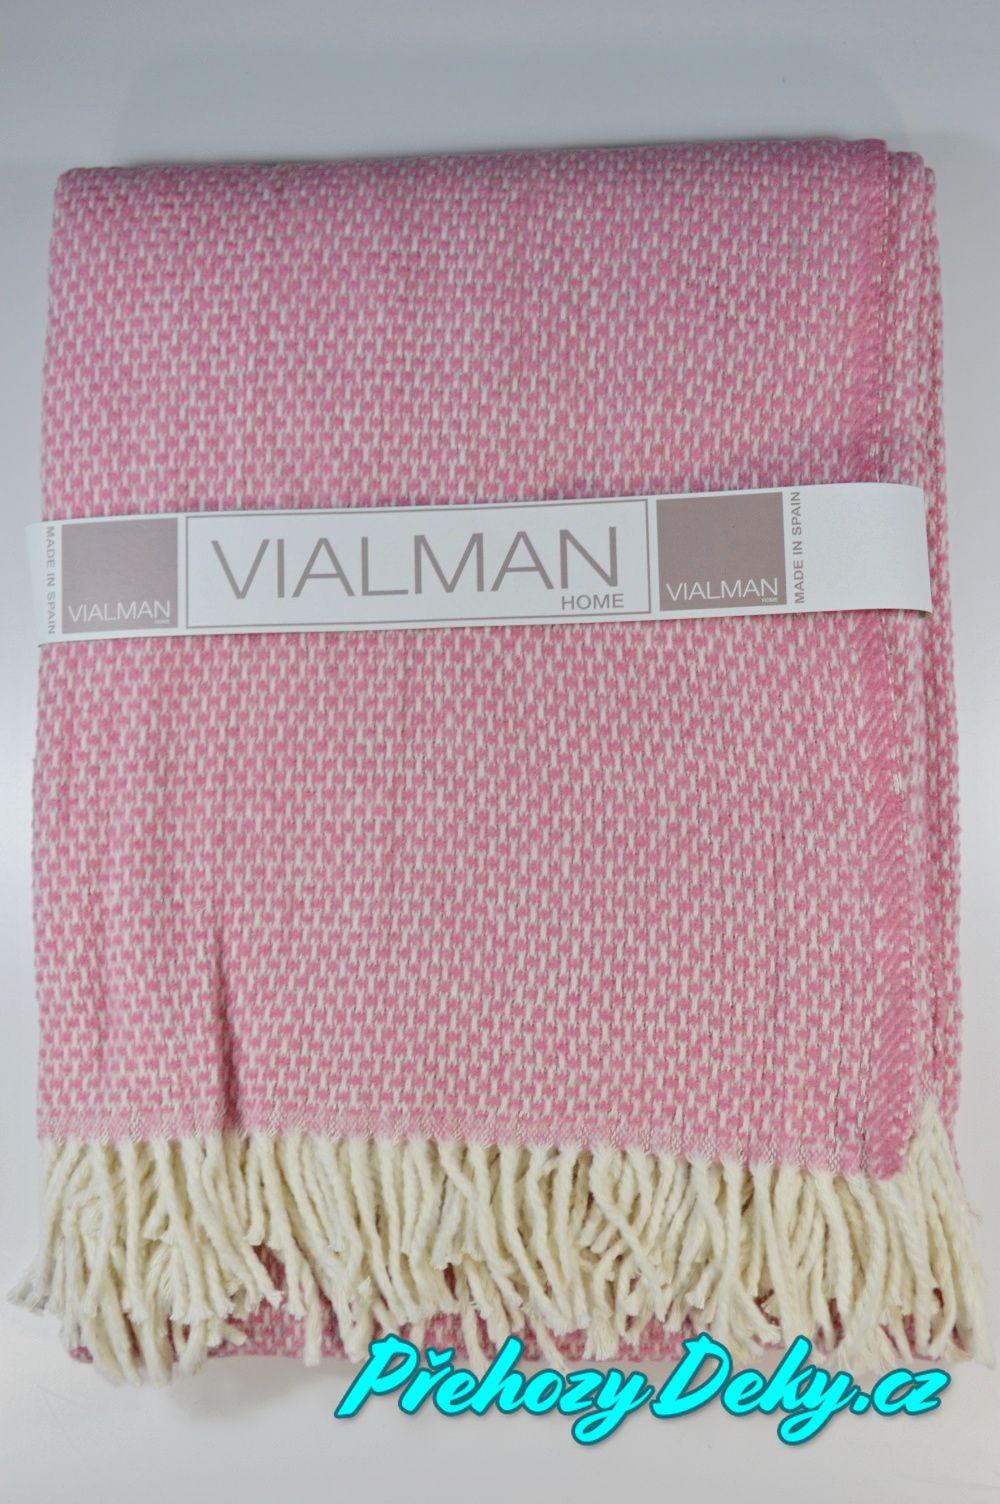 pletený pléd s třásněmi, plédy na postel, společenské plédy Vialman